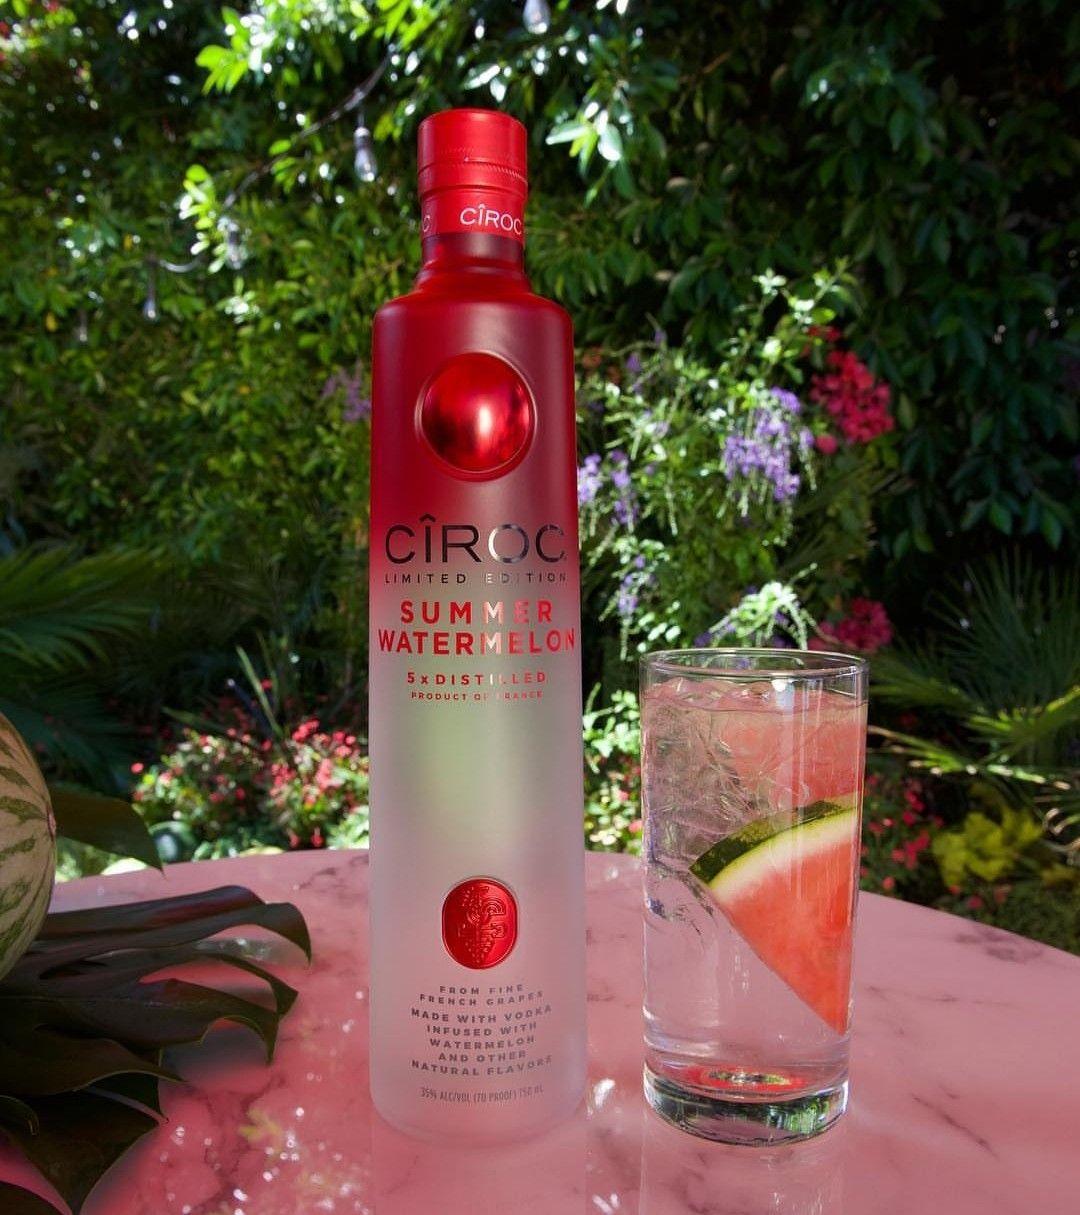 Ciroc Watermelon Ciroc Drinks Ciroc Bottle Ciroc Vodka